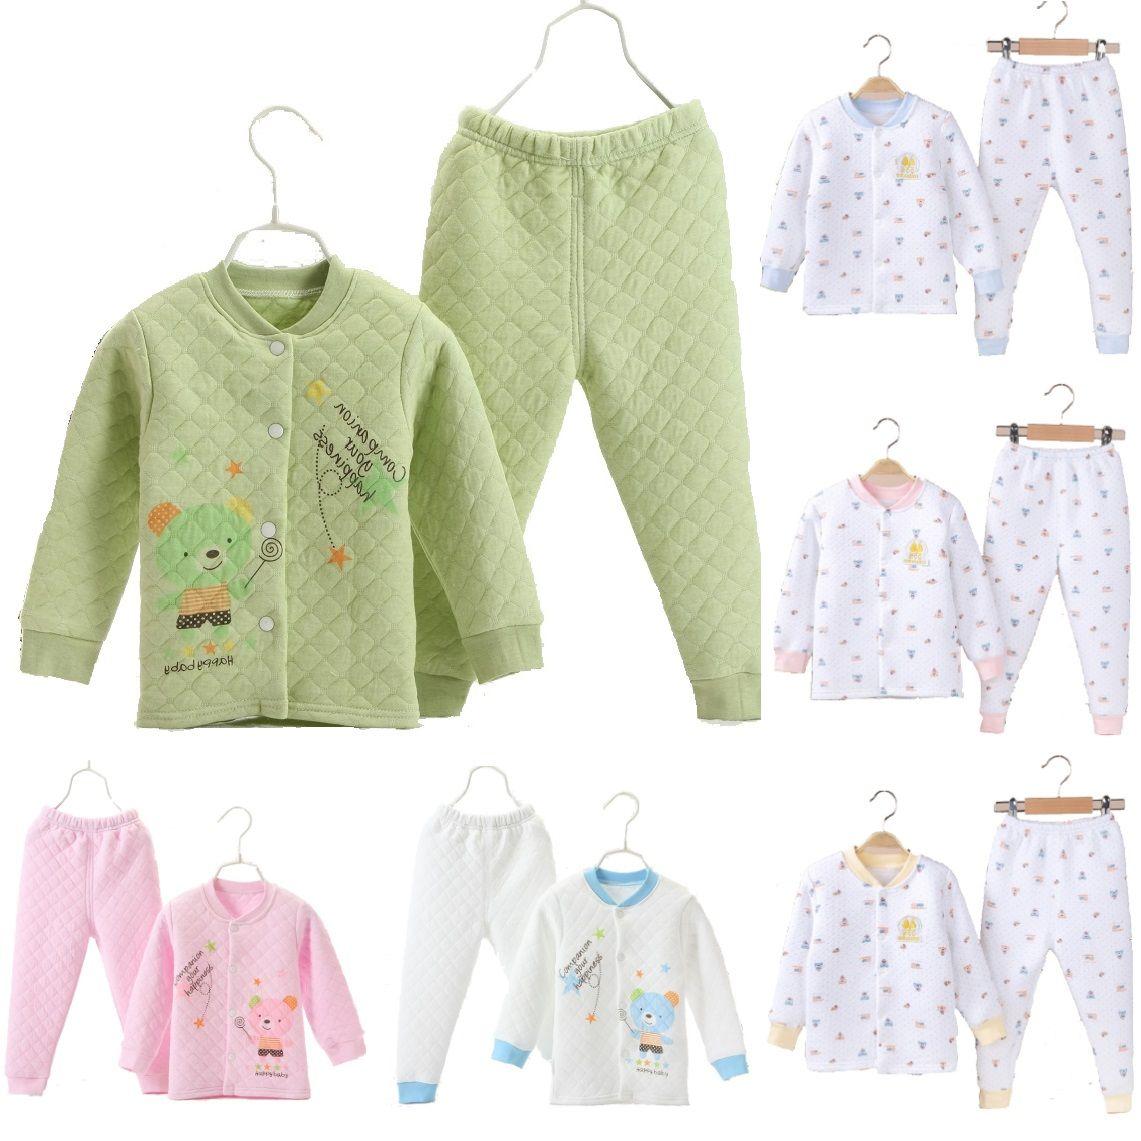 6cad709ee 3 Layers Winter Baby Boys Pajamas Clothes Suit 100% Cotton Newborn ...